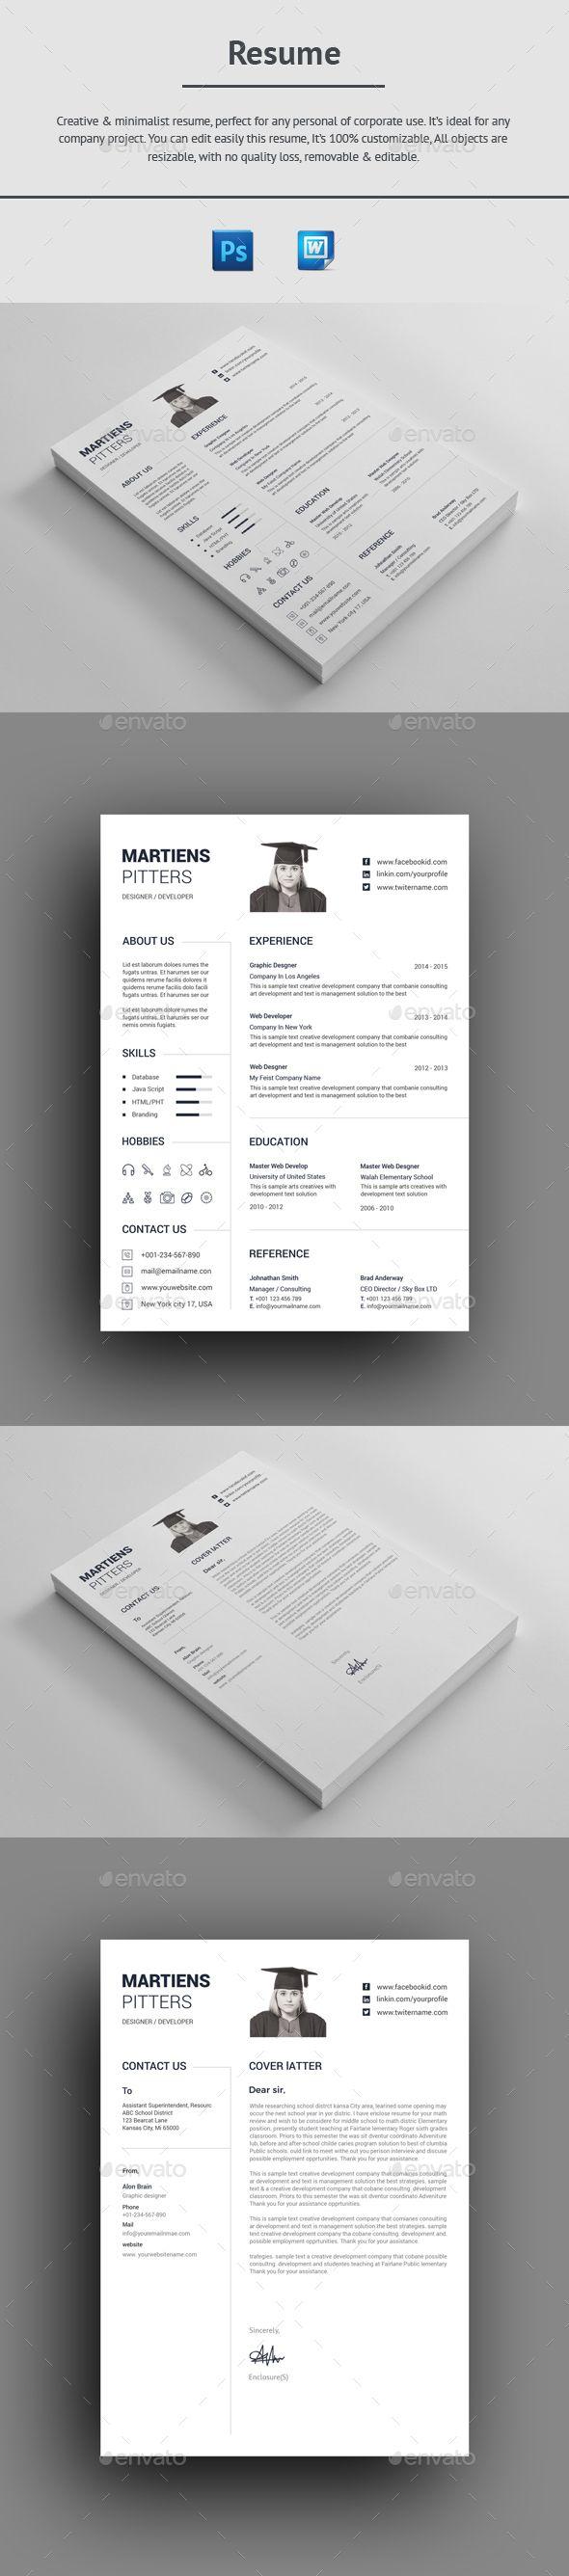 Resume Design Template PSD, MS Word Resume design